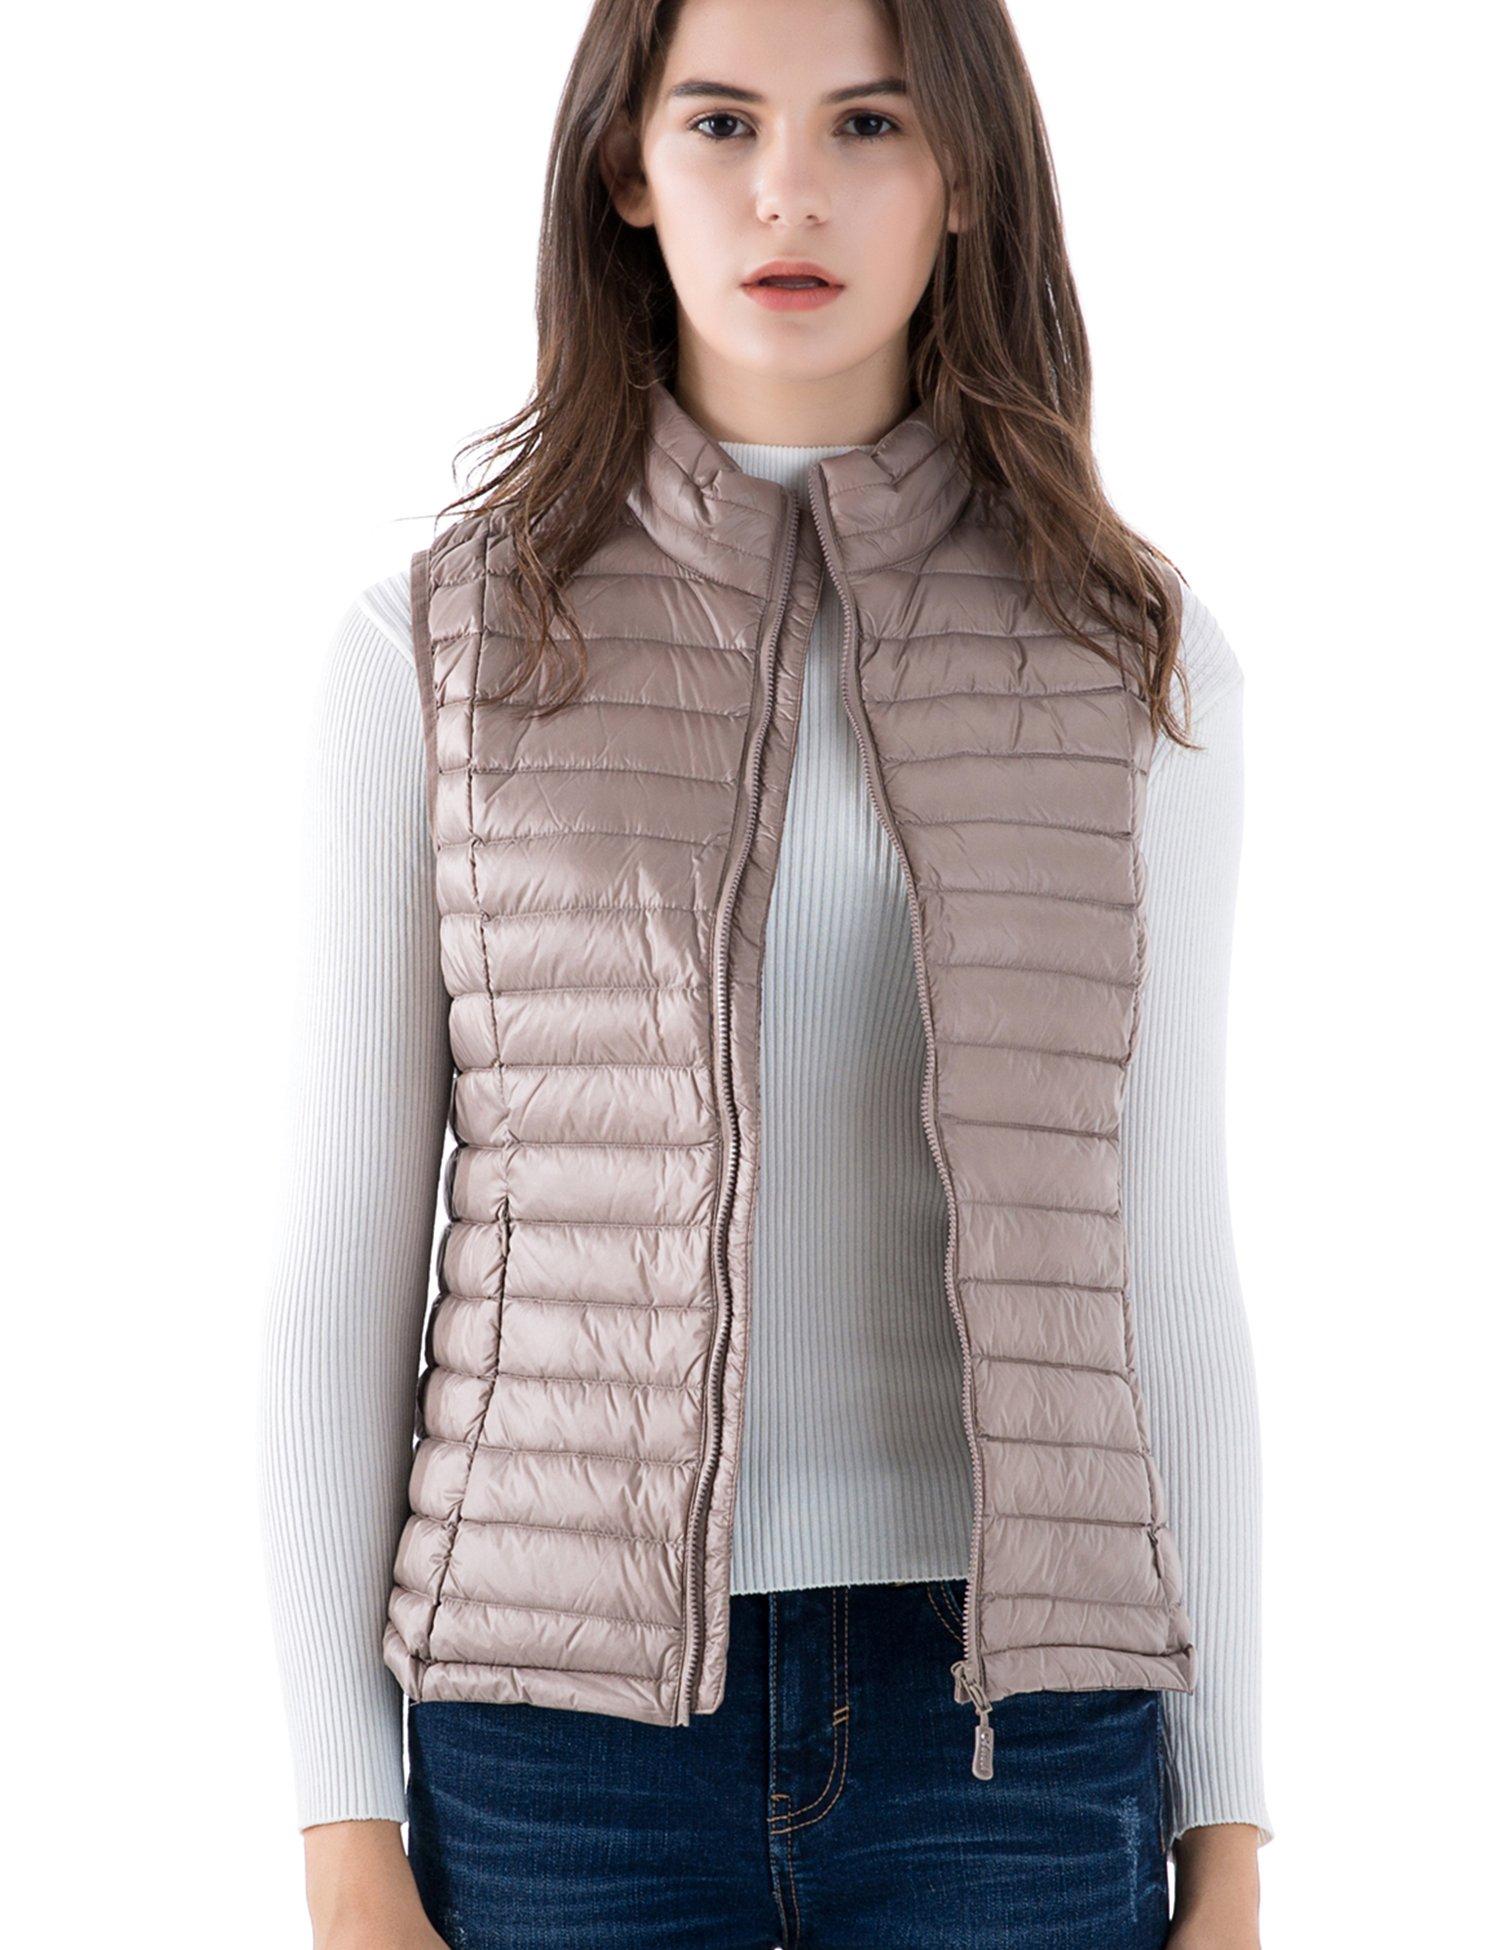 CHERRY CHICK Women's Ultralight Packable Down Vest (L, Beige-YX)